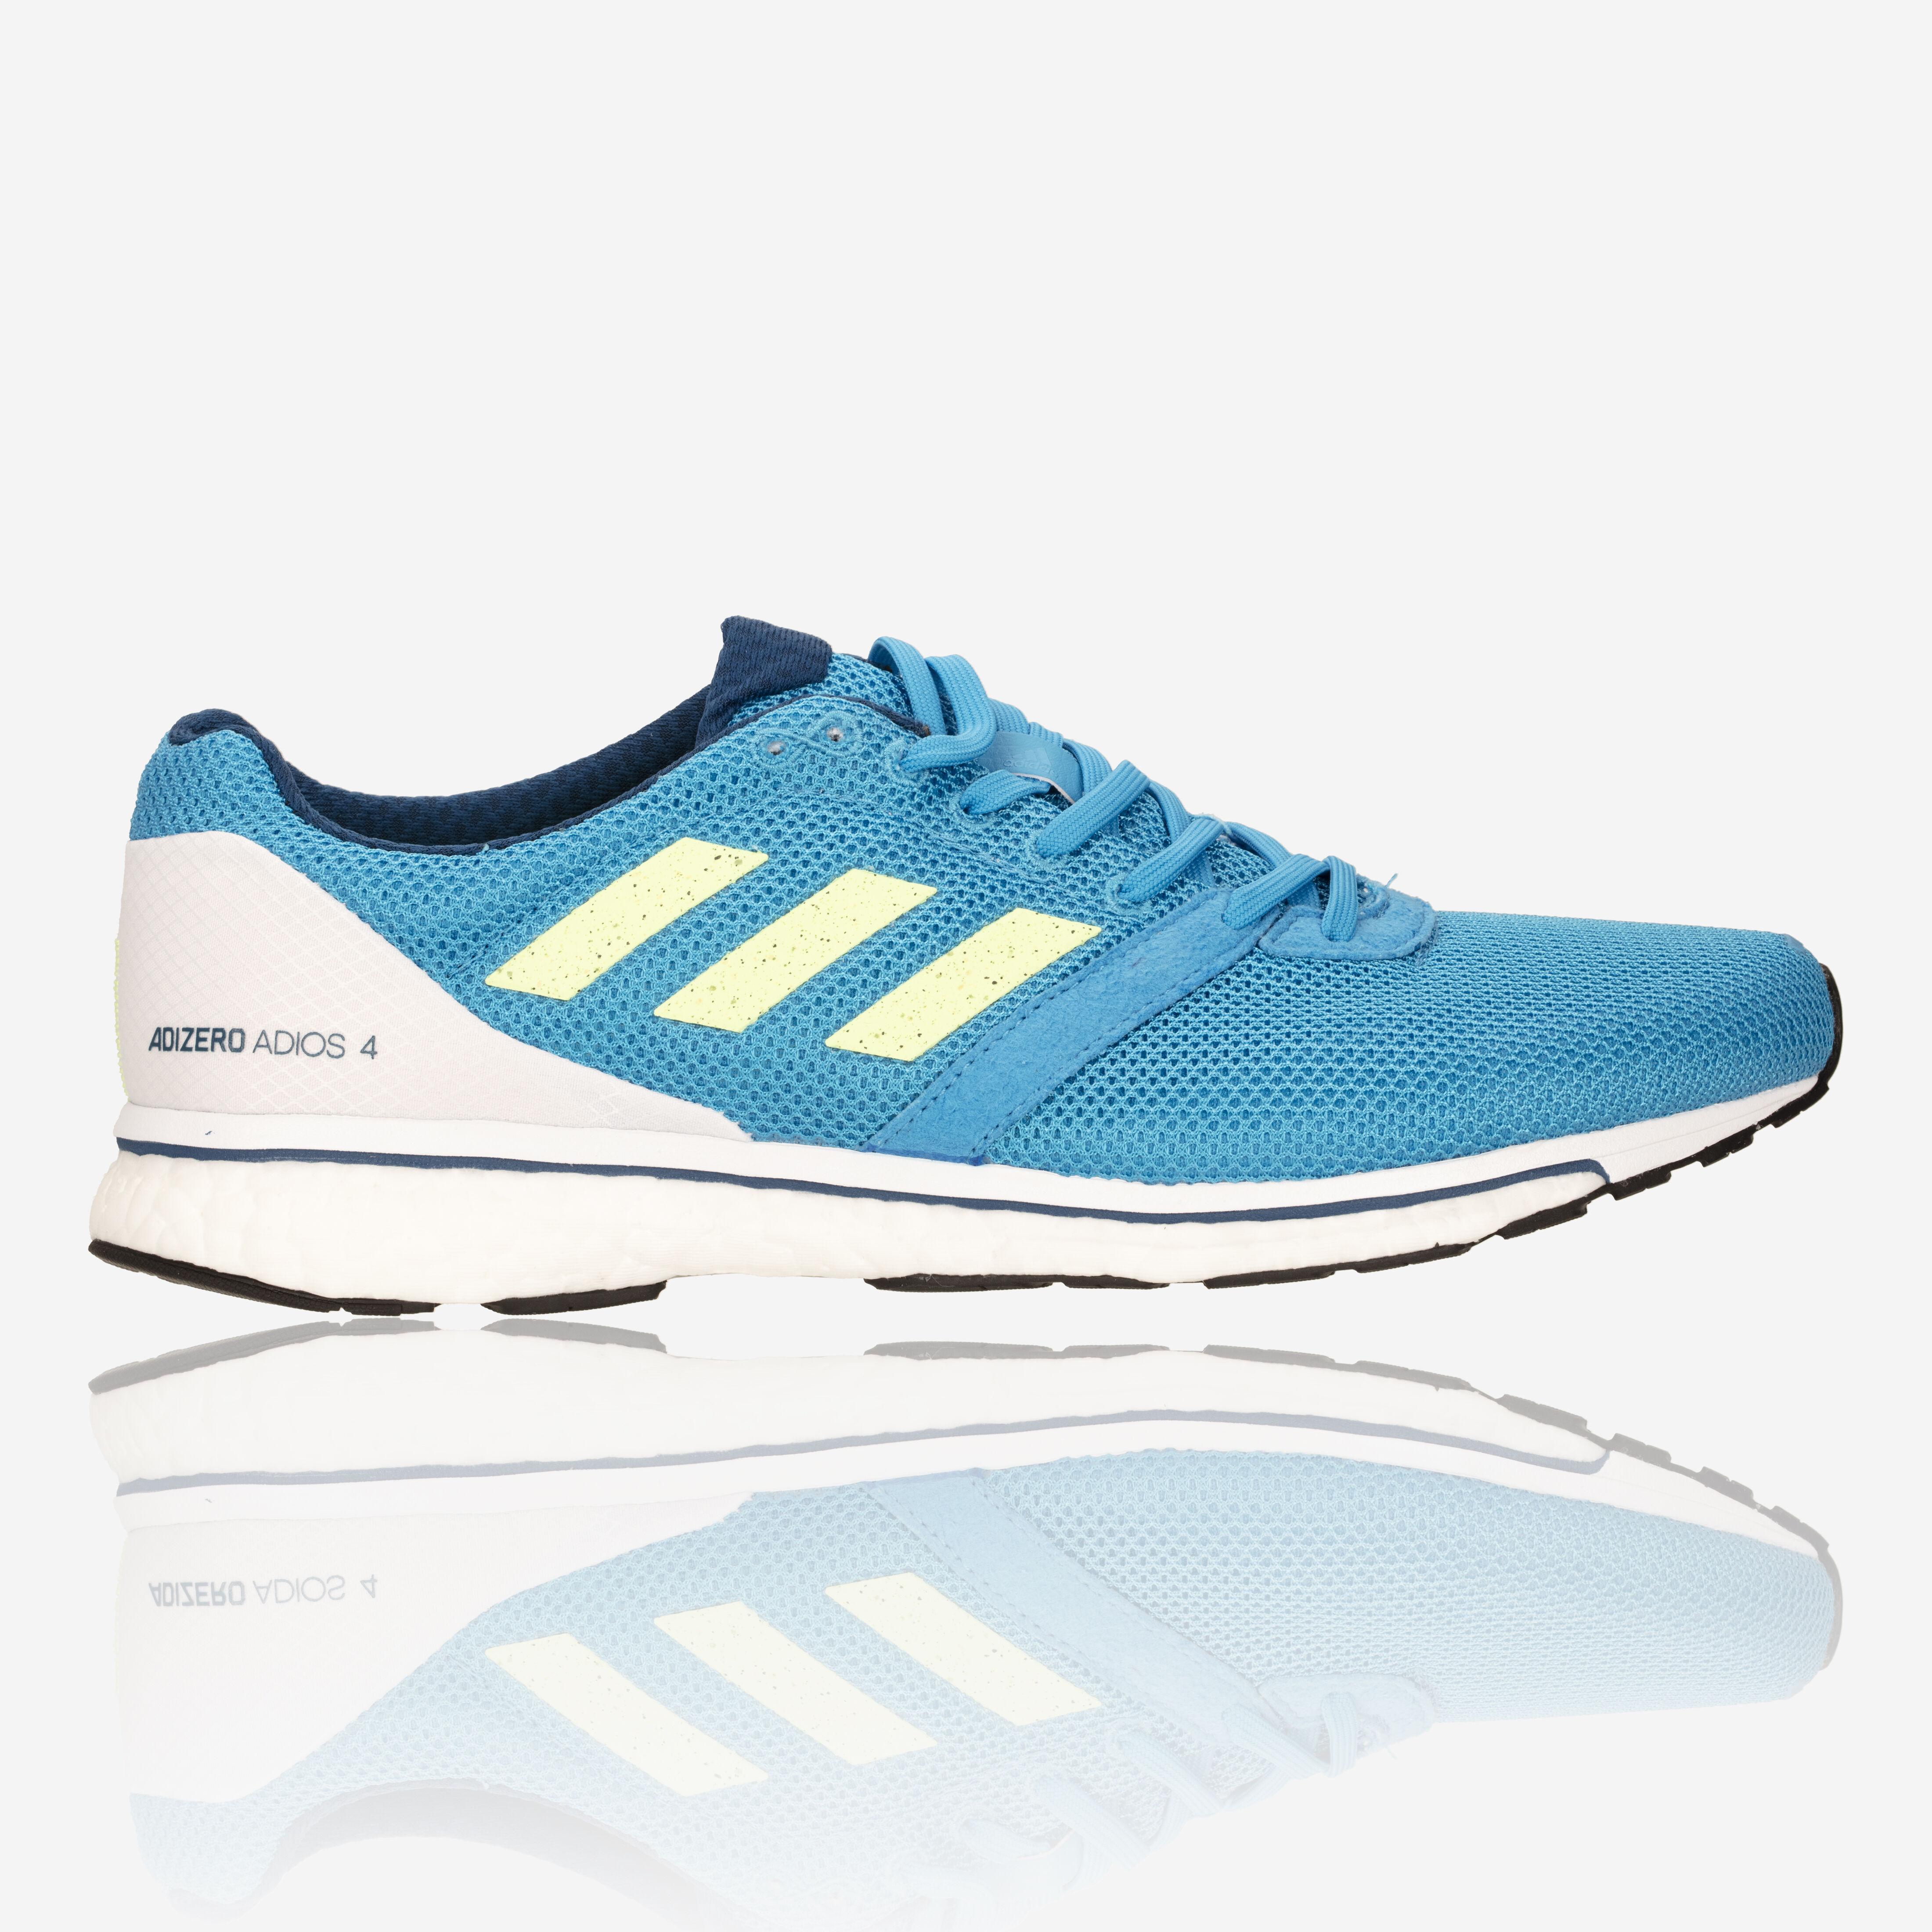 2965d79308 Adidas Adizero Adios 4 shoes 2019